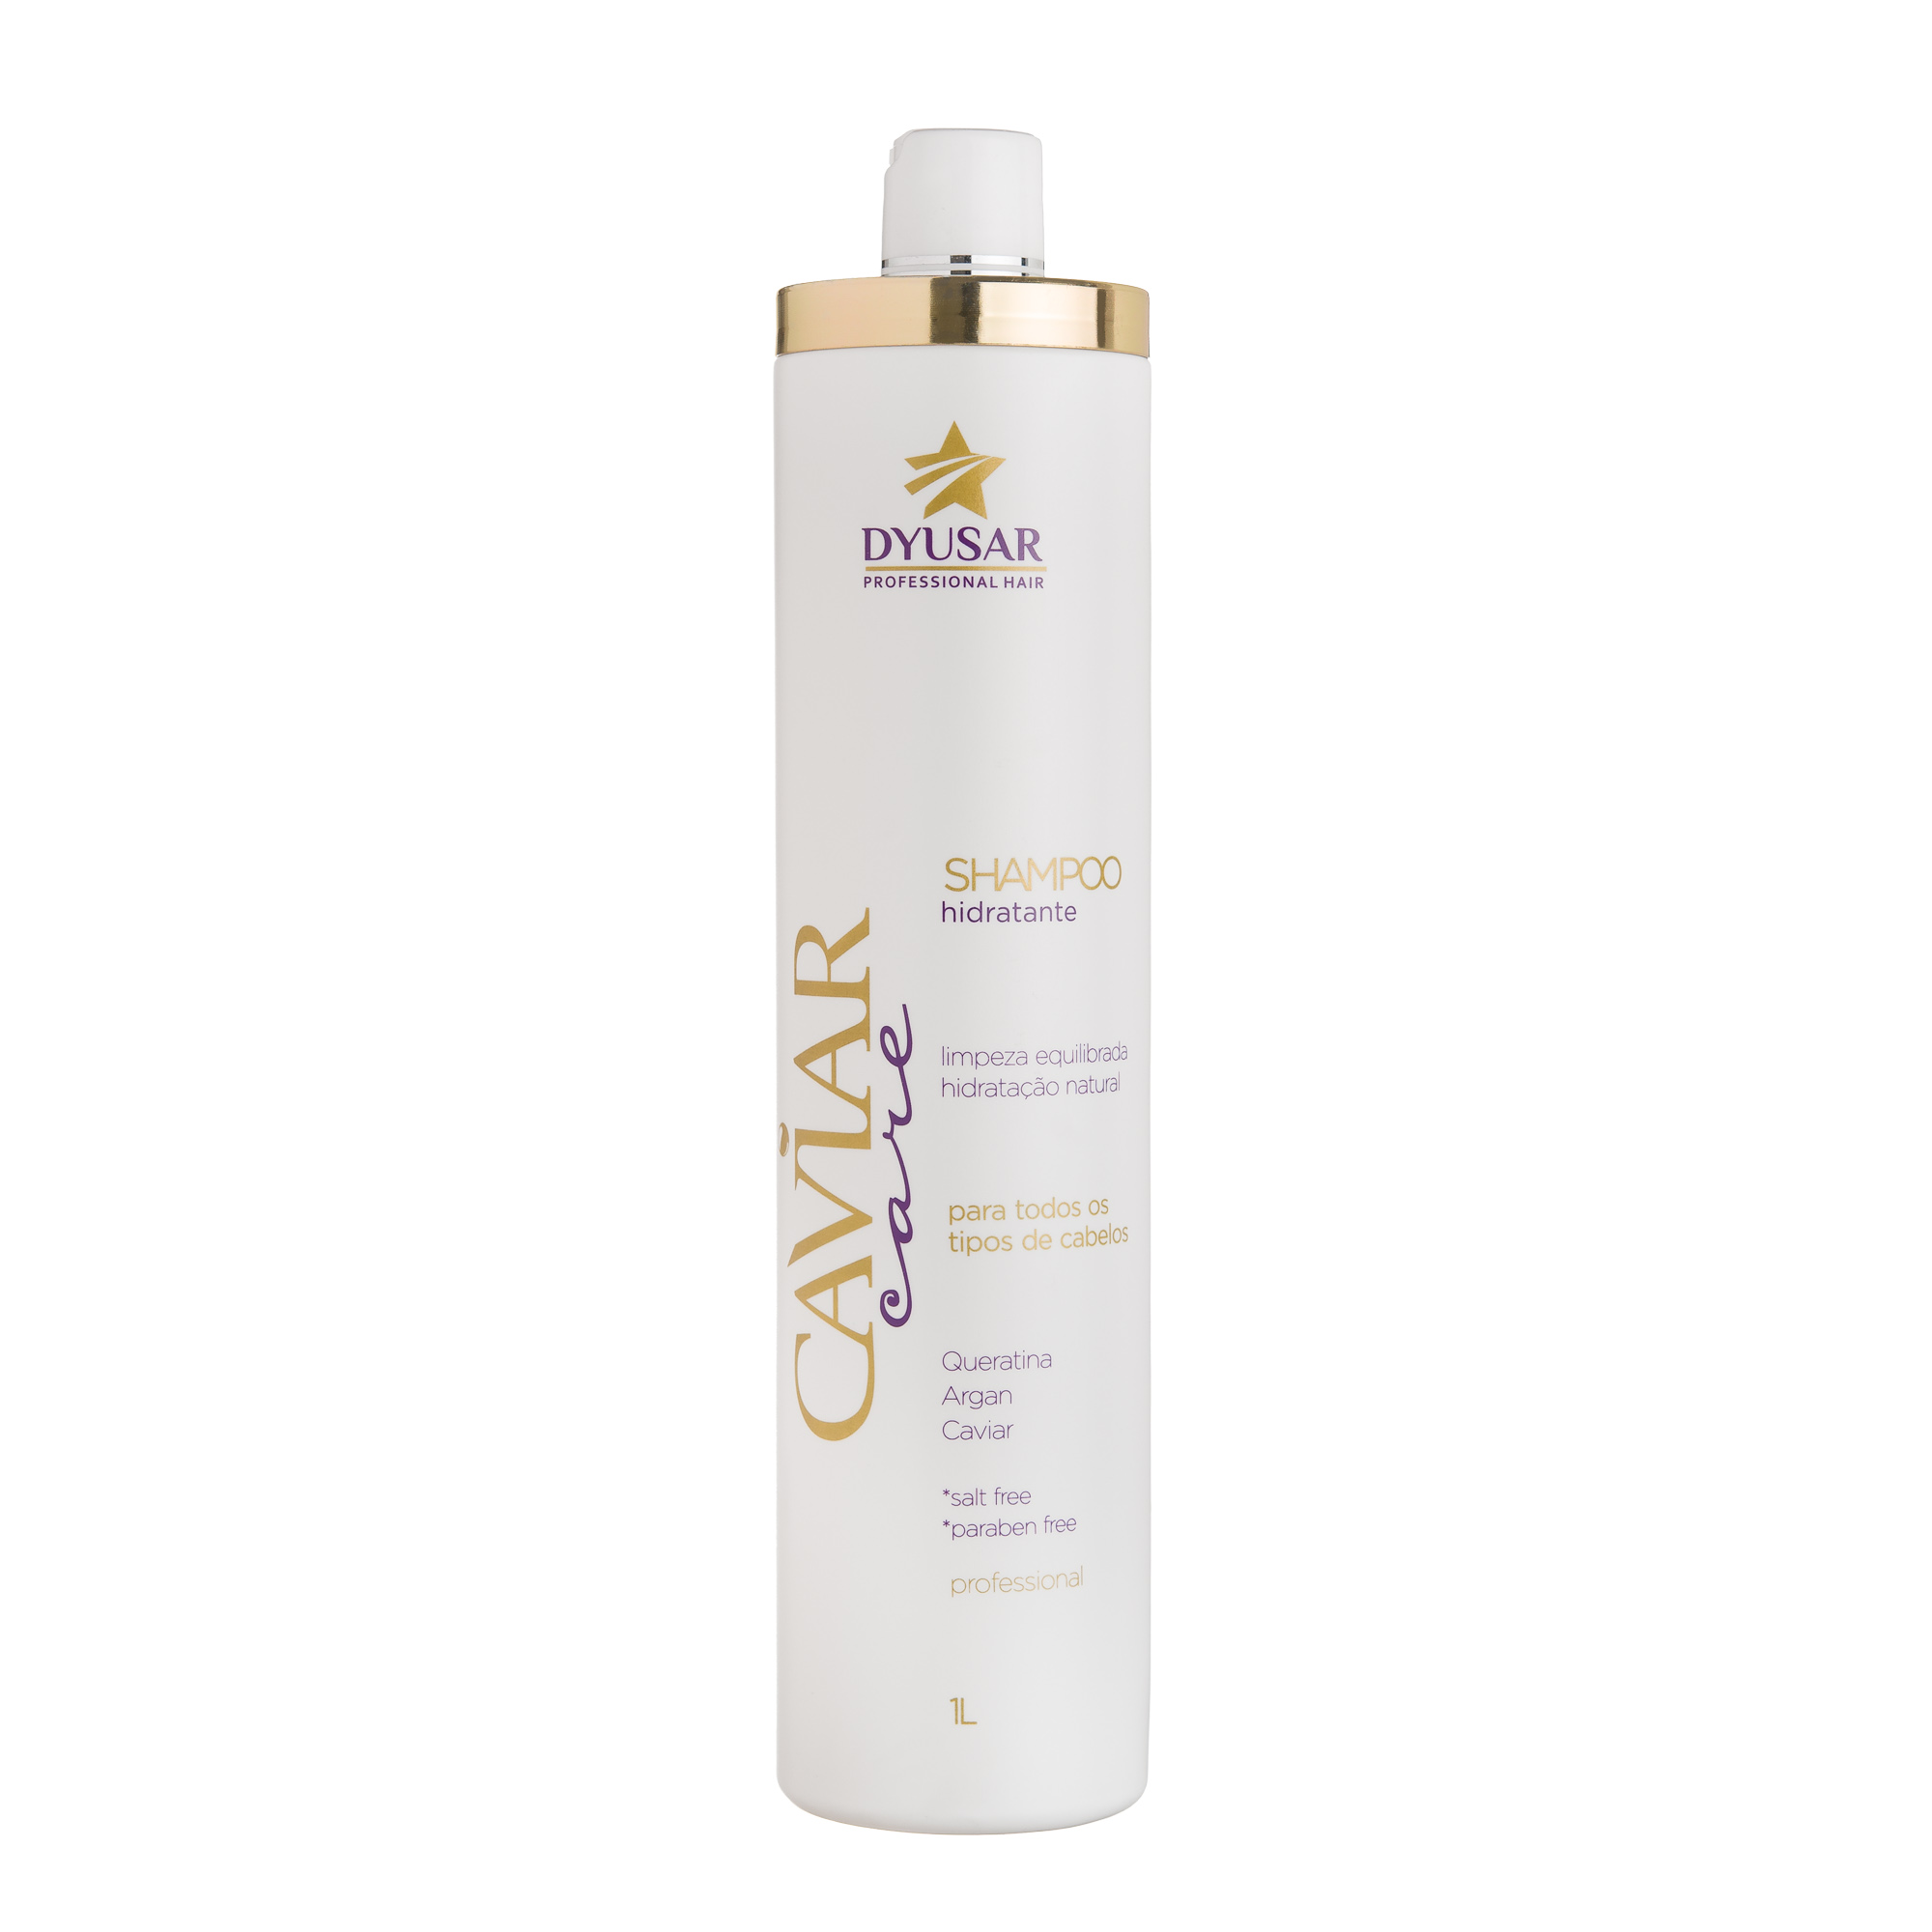 Shampoo Hidratante Caviar 1 L DYUSAR